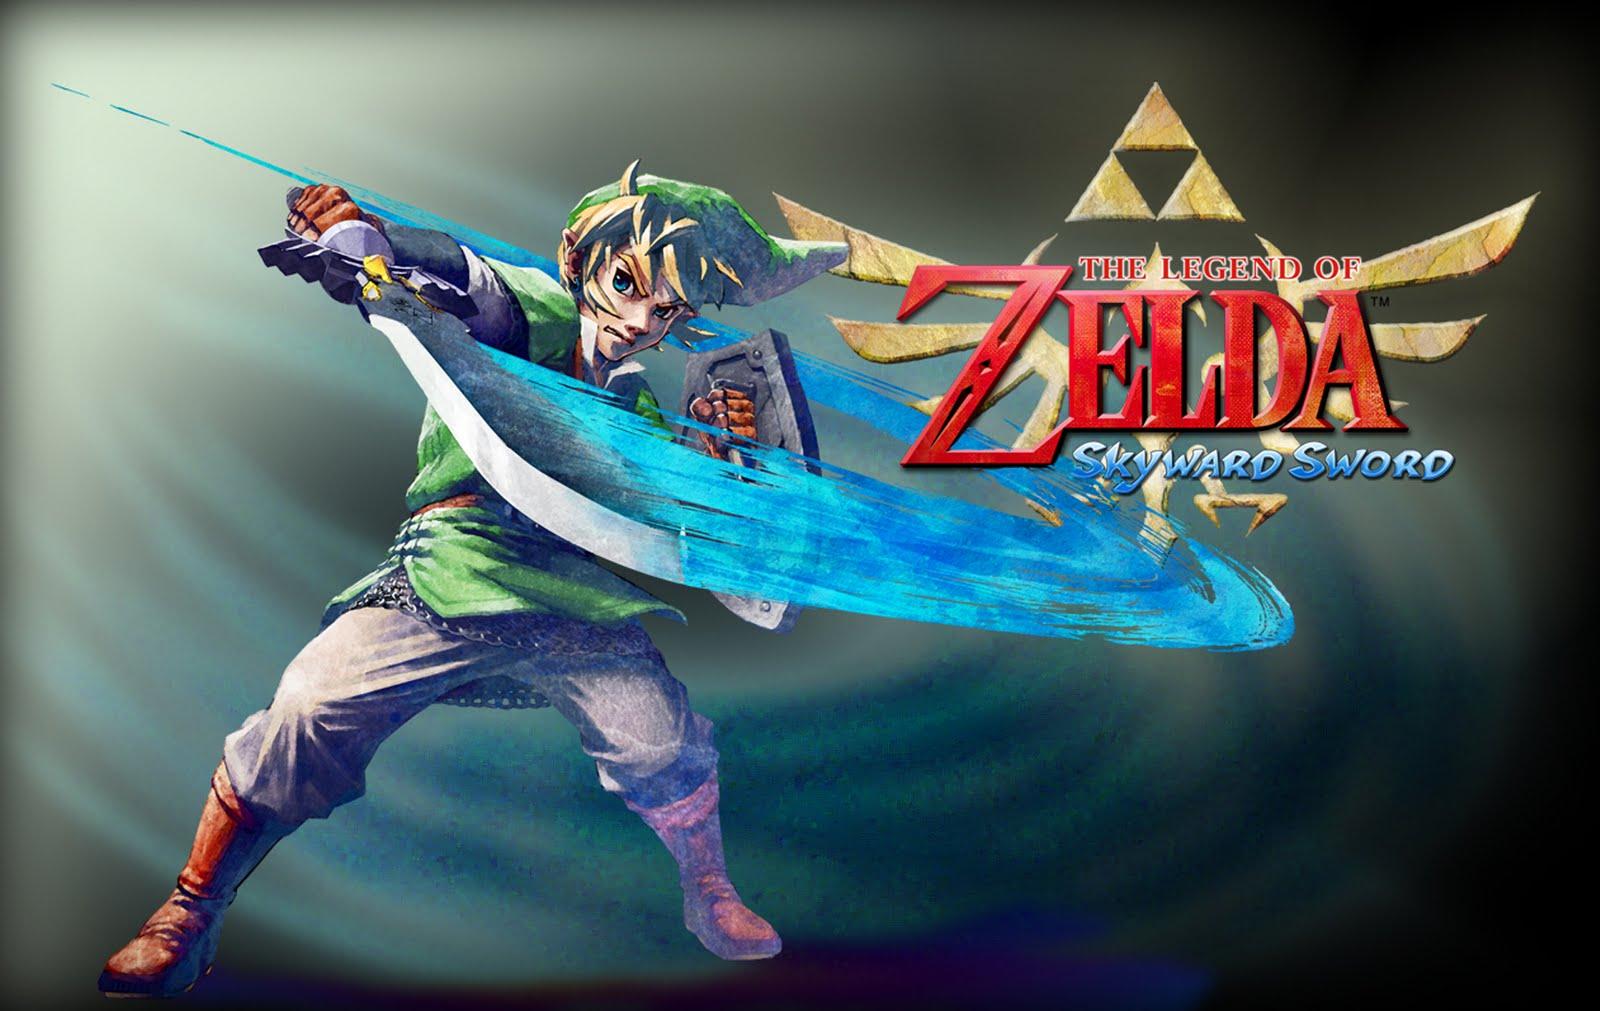 The Legend Of Zelda Skyward Sword Wallpaper 5 Wallpapersbq